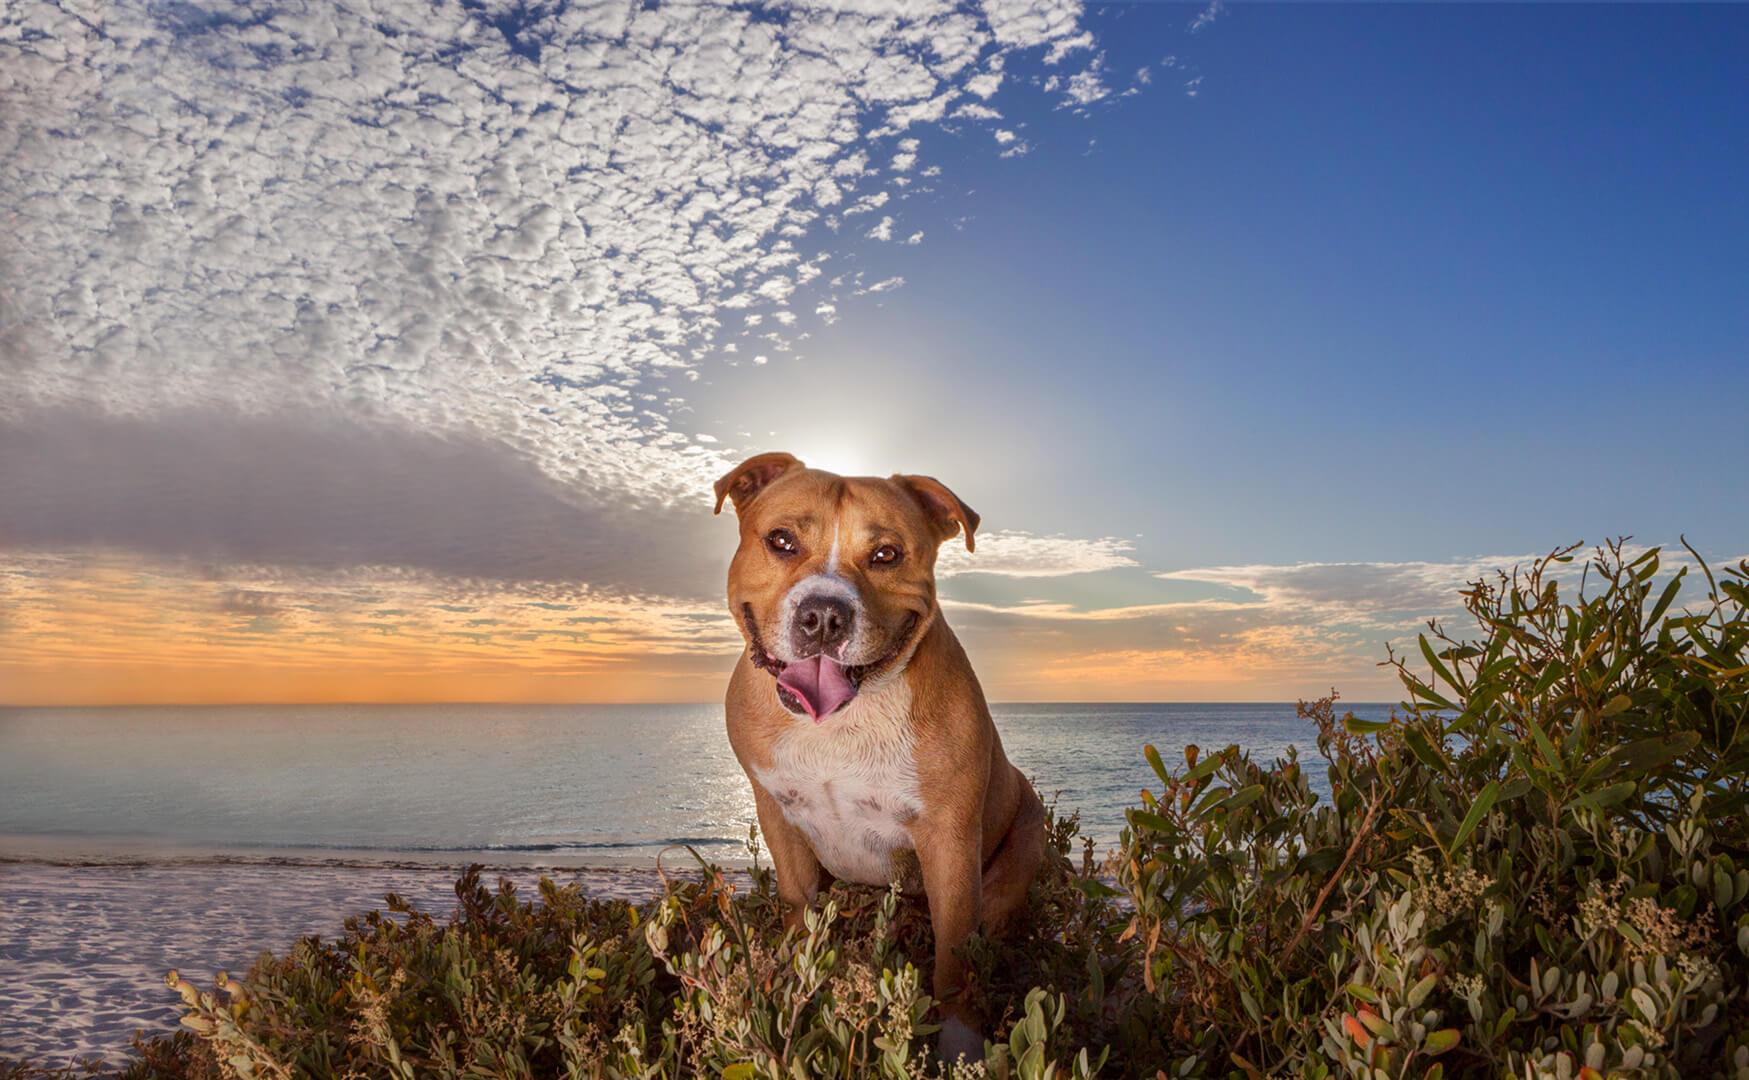 IMG_2550-beach dog.jpg